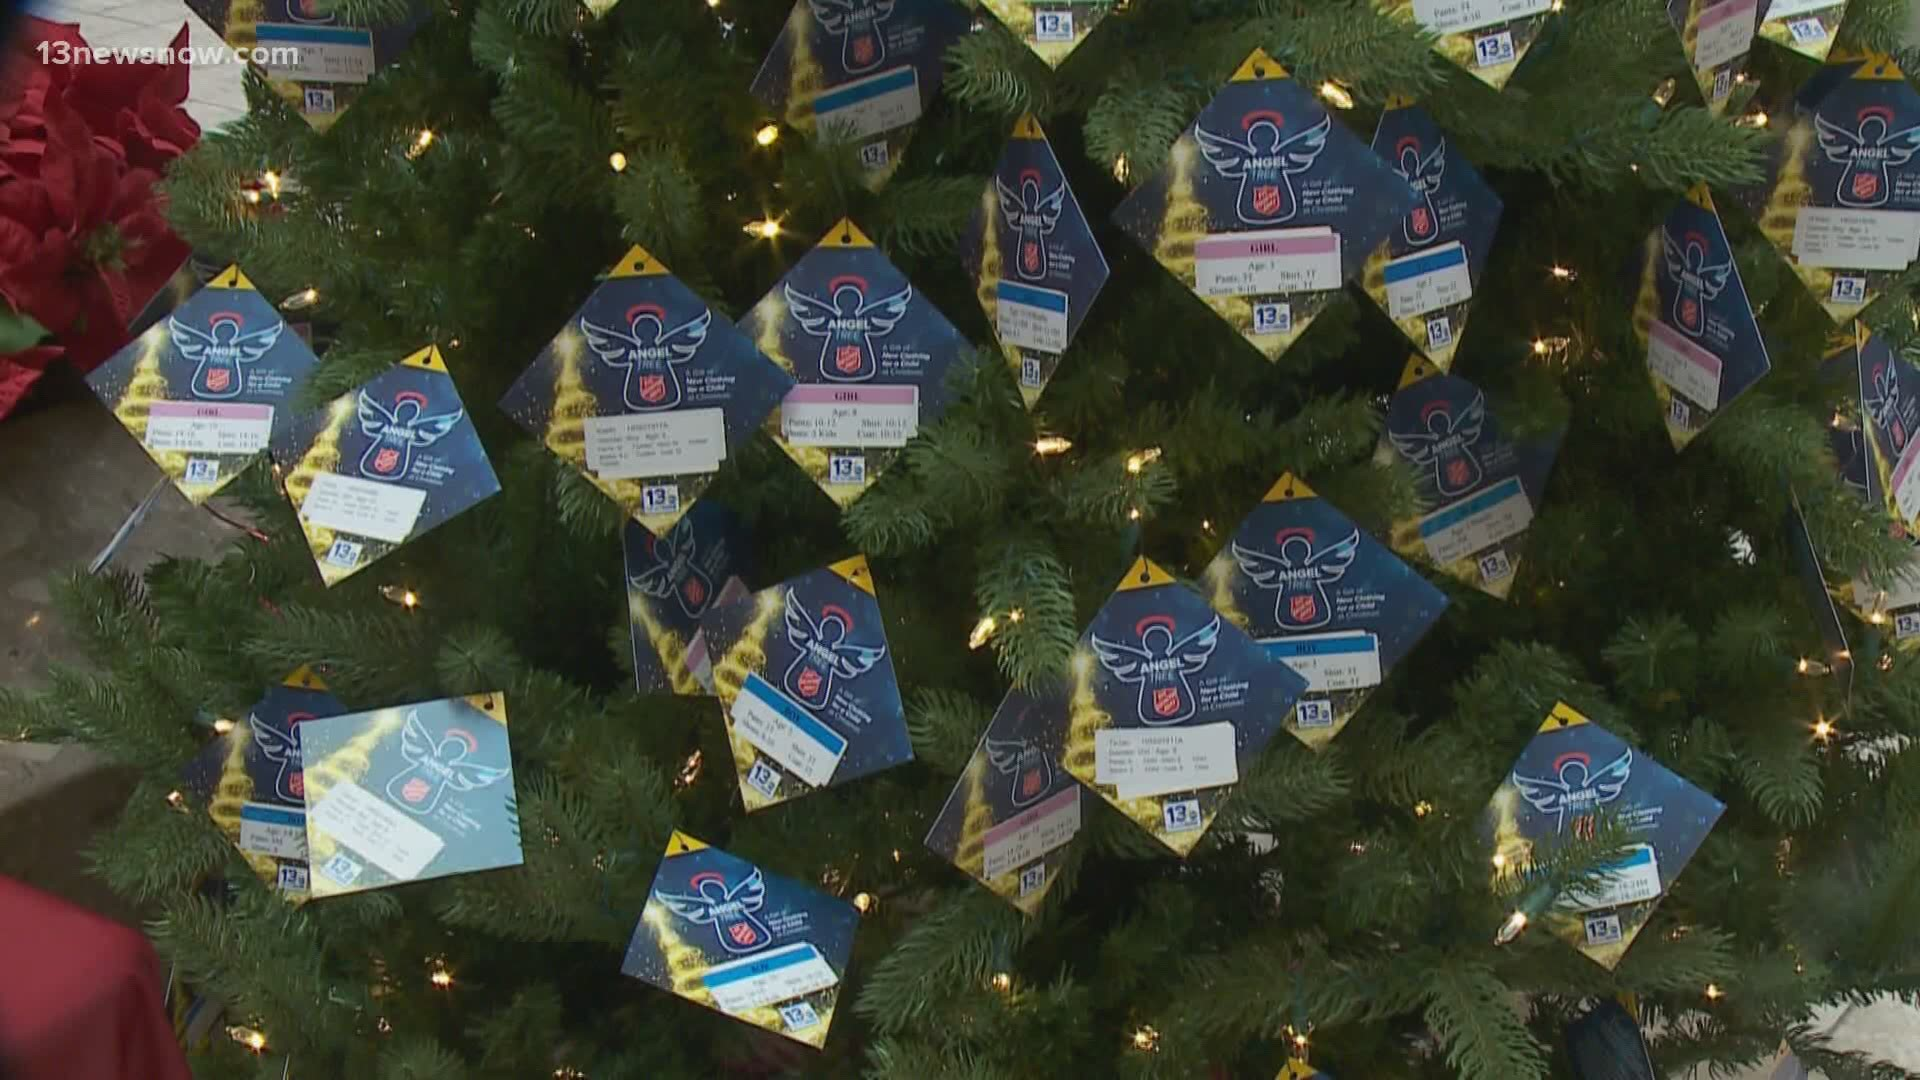 Hampton Roads Christmas Events 2020 Salvation Army Angel Tree Hampton Roads 2020 | 13newsnow.com